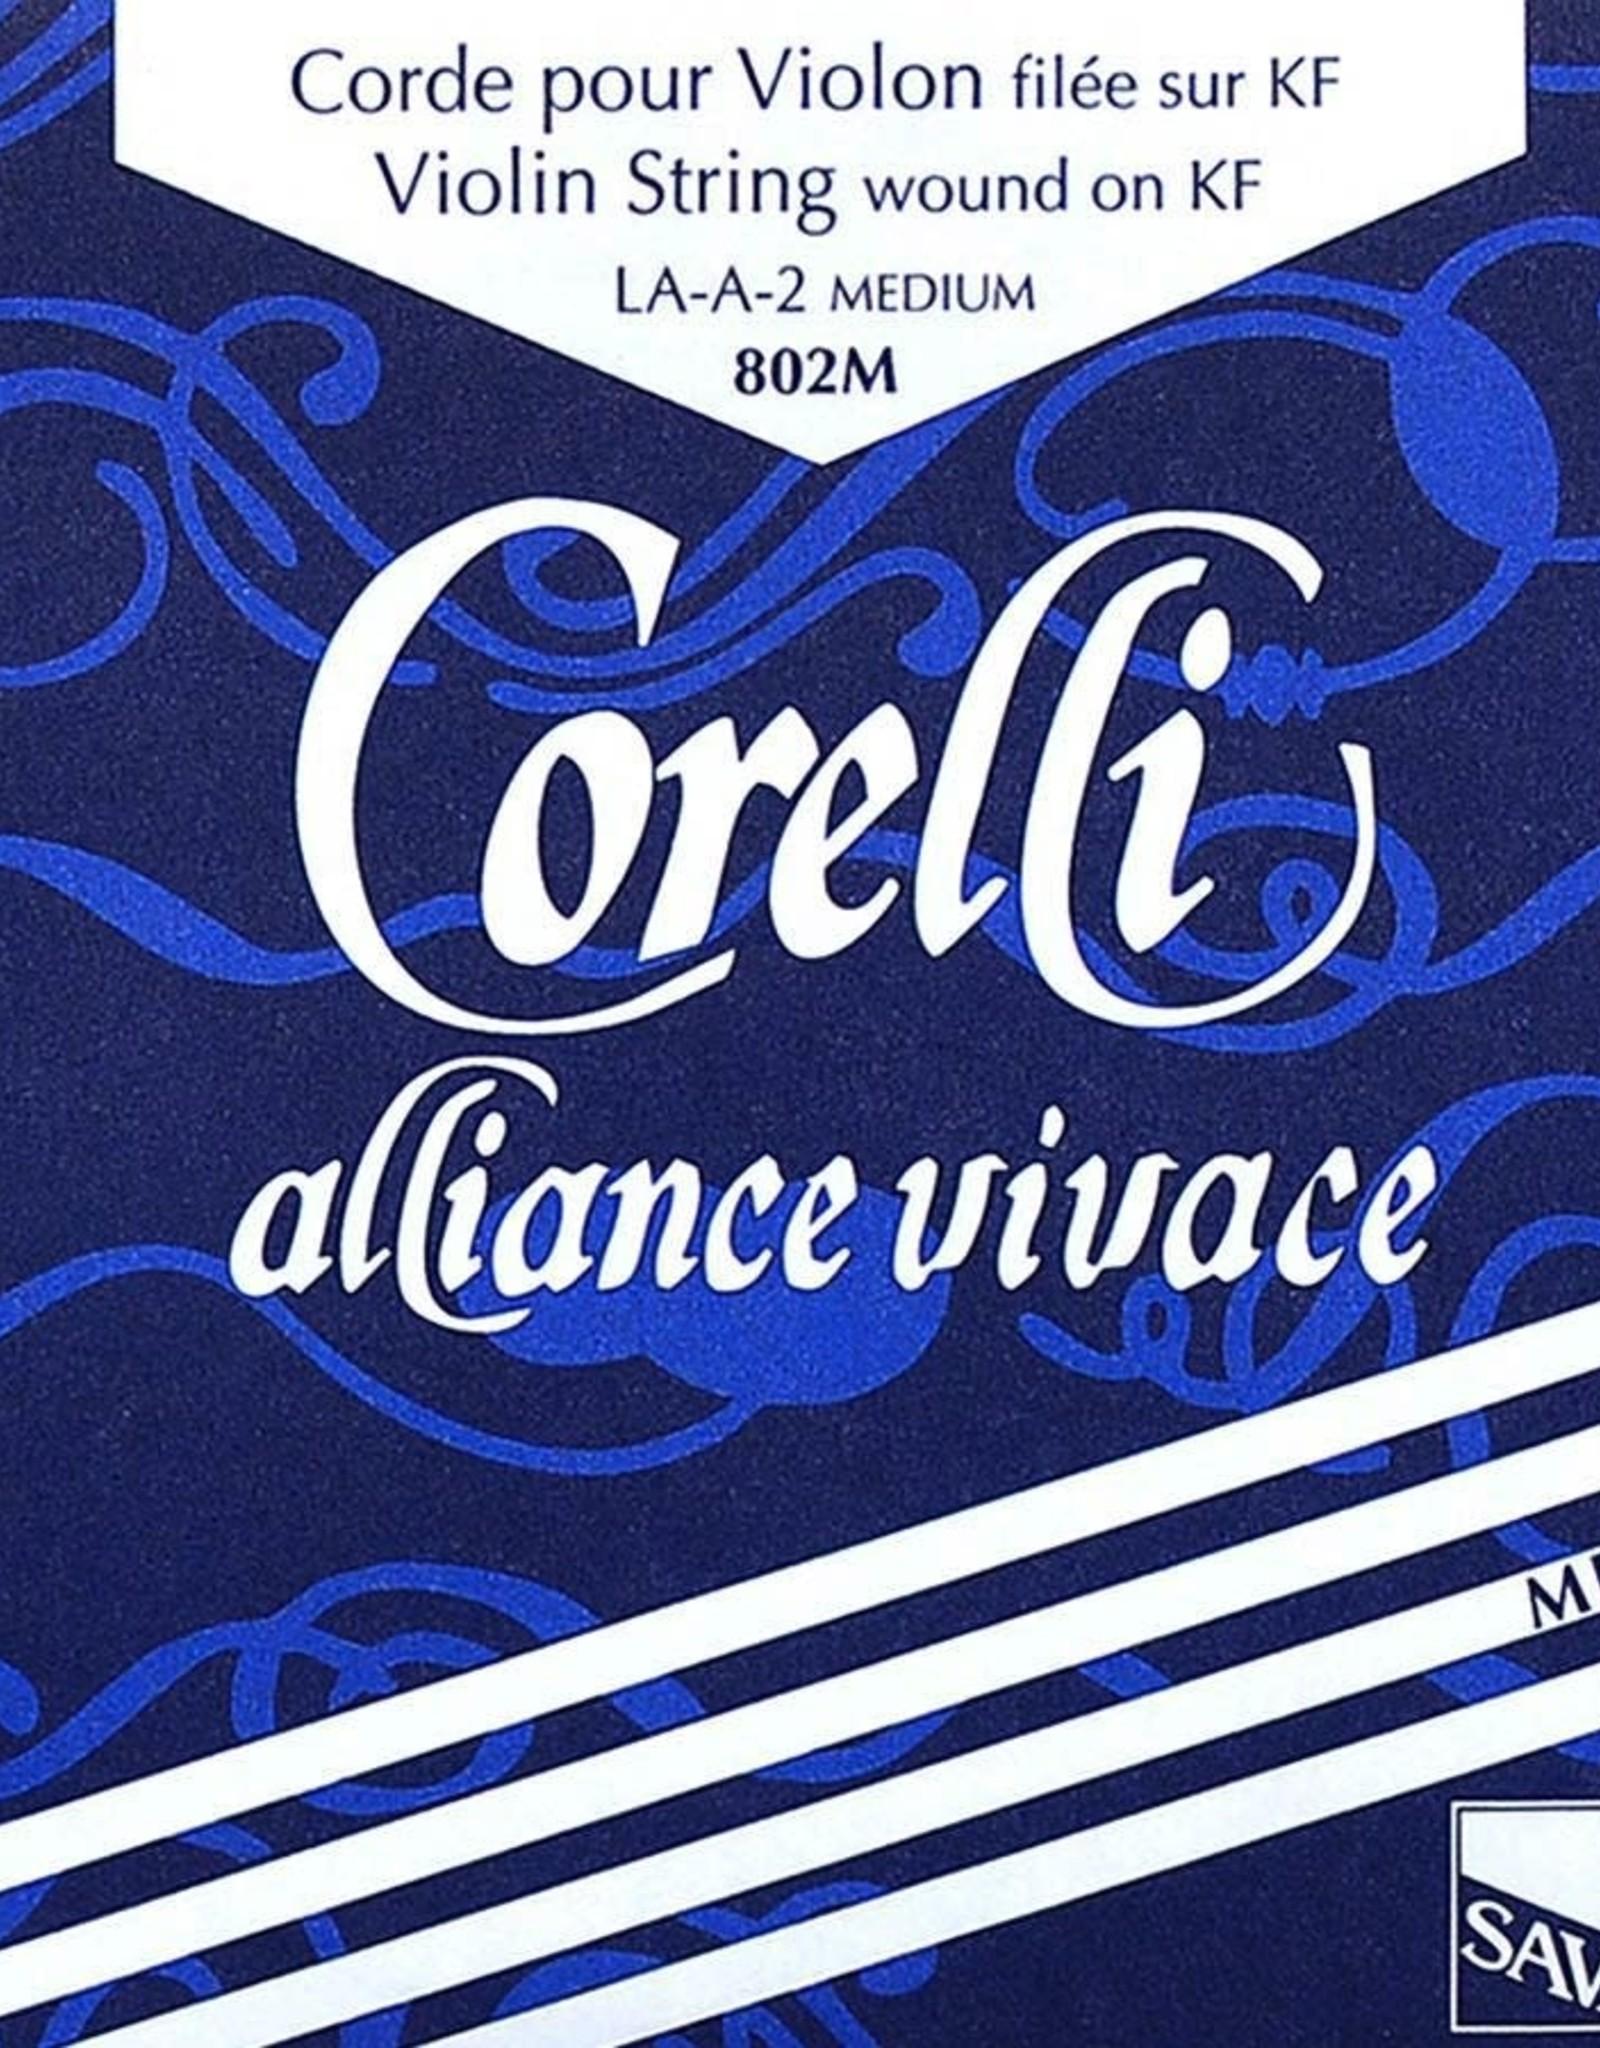 CORELLI Alliance vivace, vioolsnaar, la (a-2), 4/4